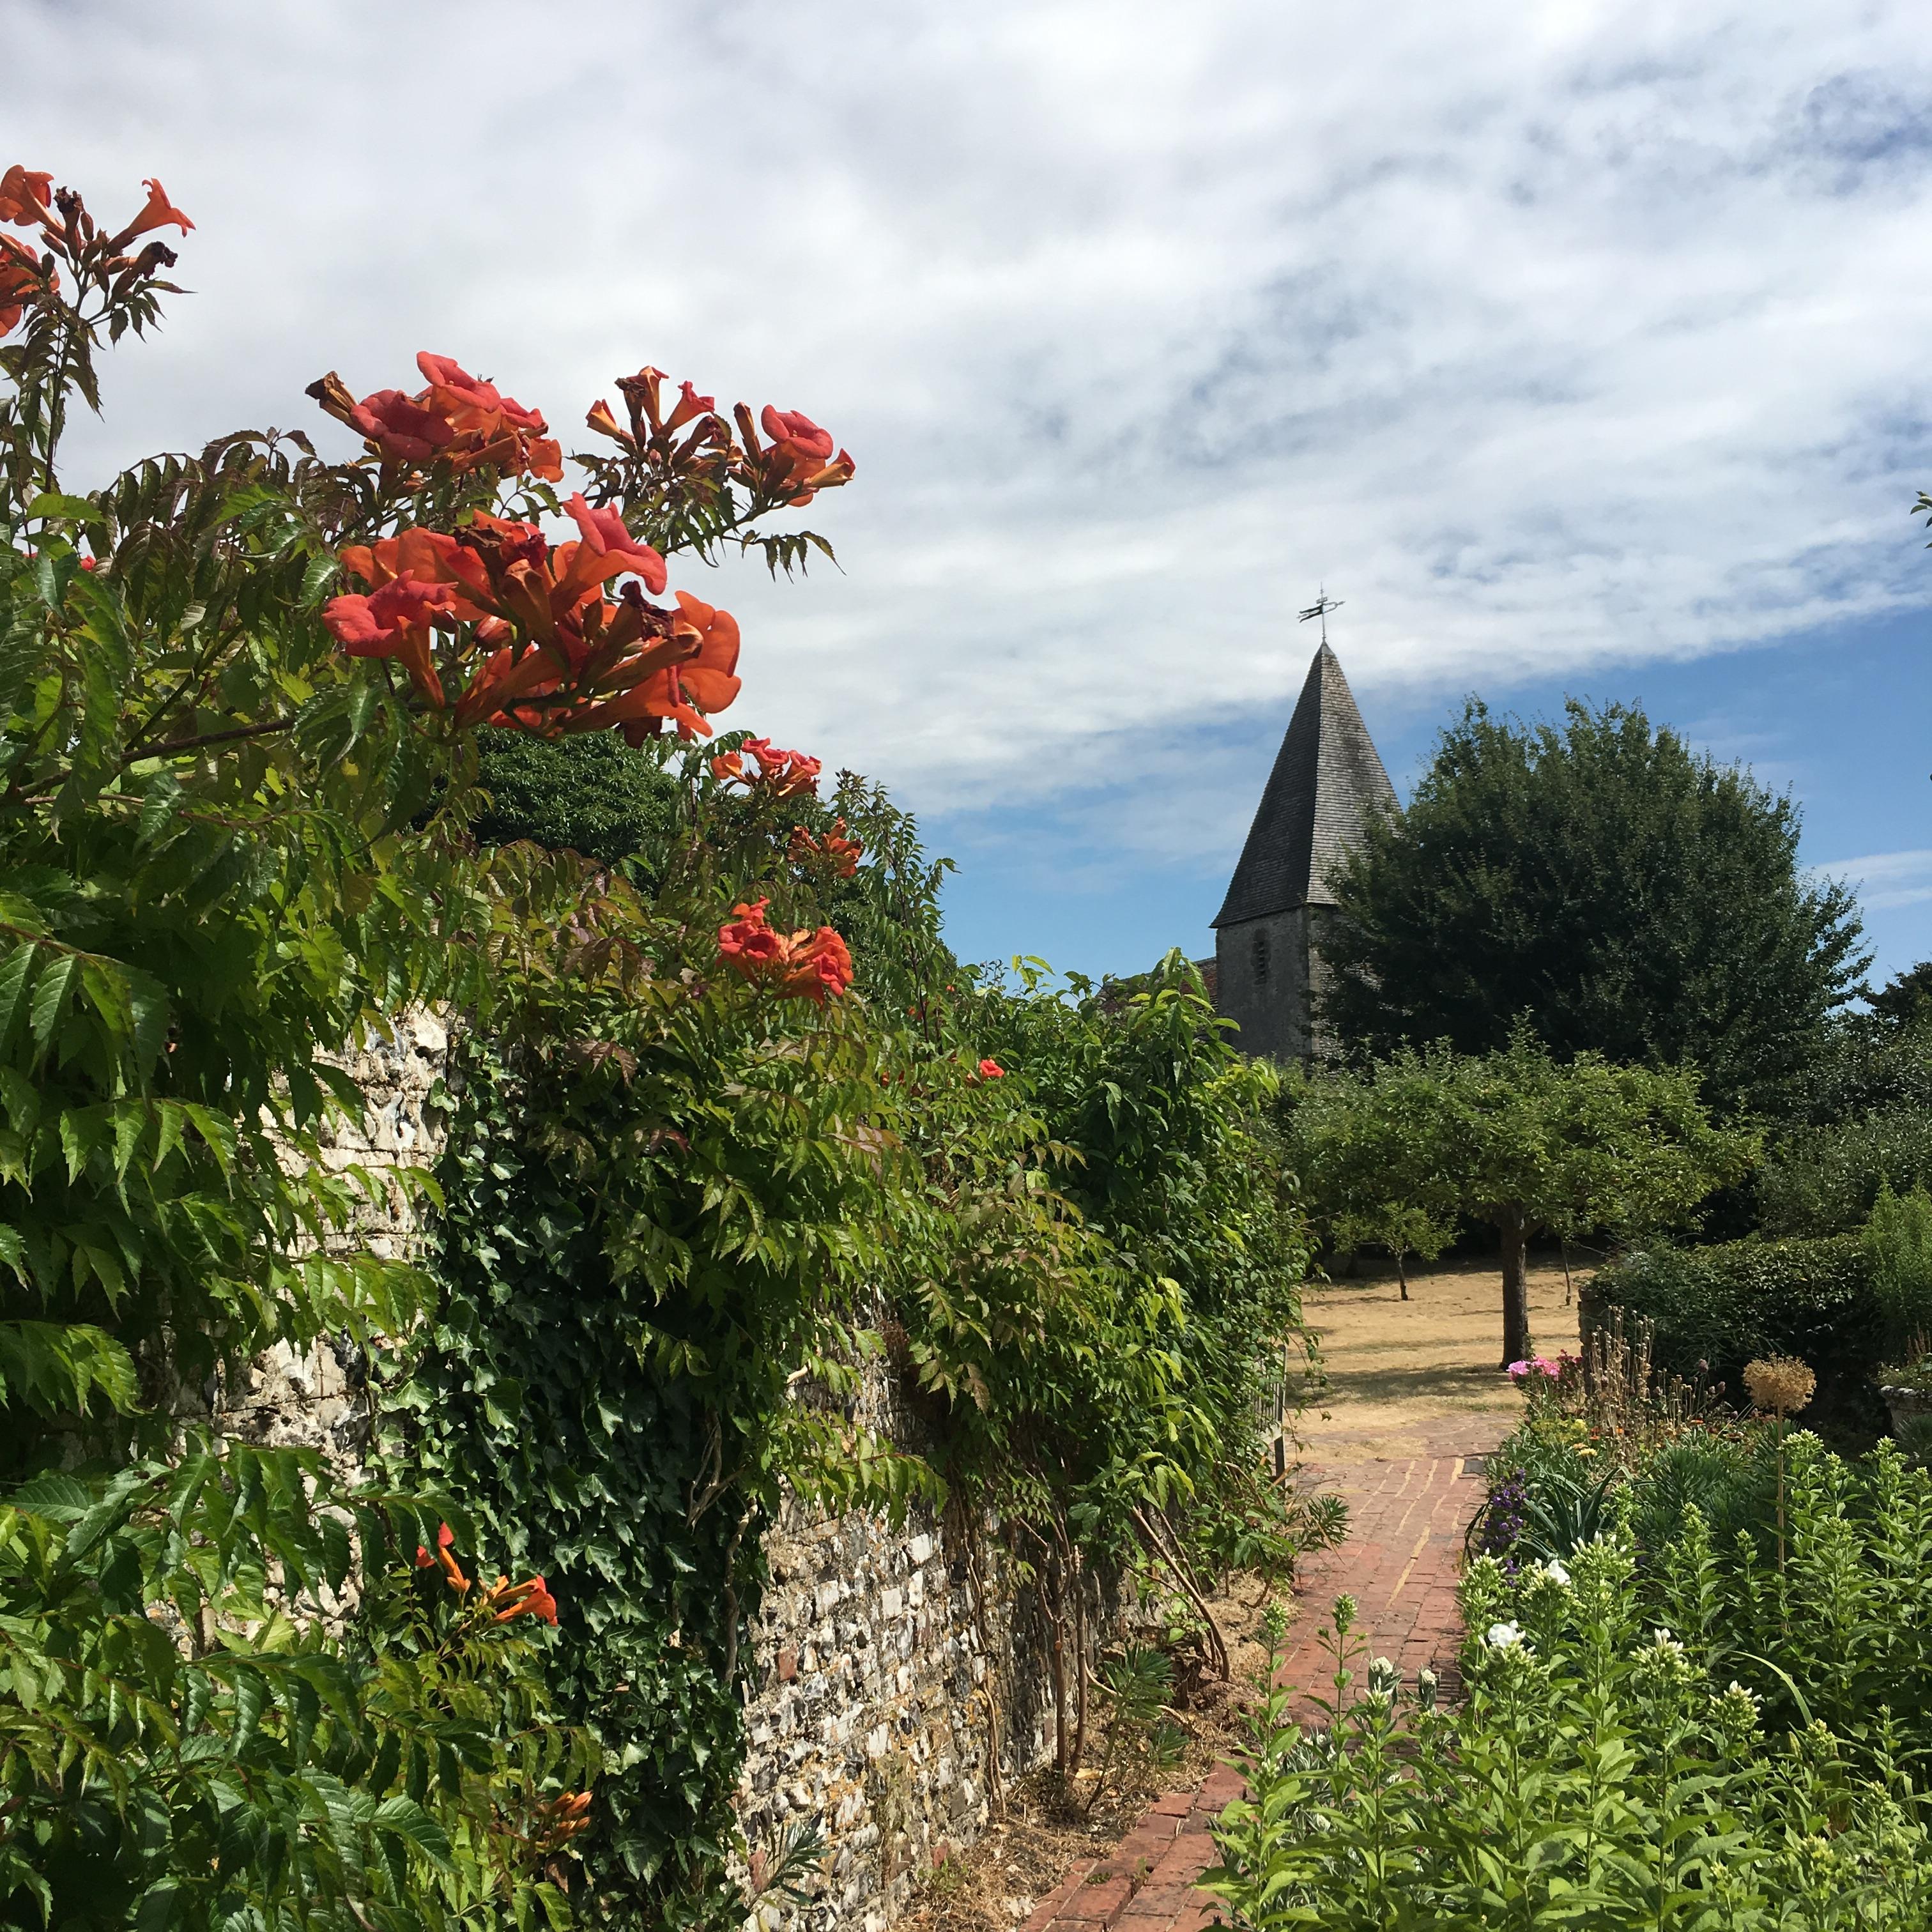 IMG_4340 garden of monks house rodmell virginia woolf